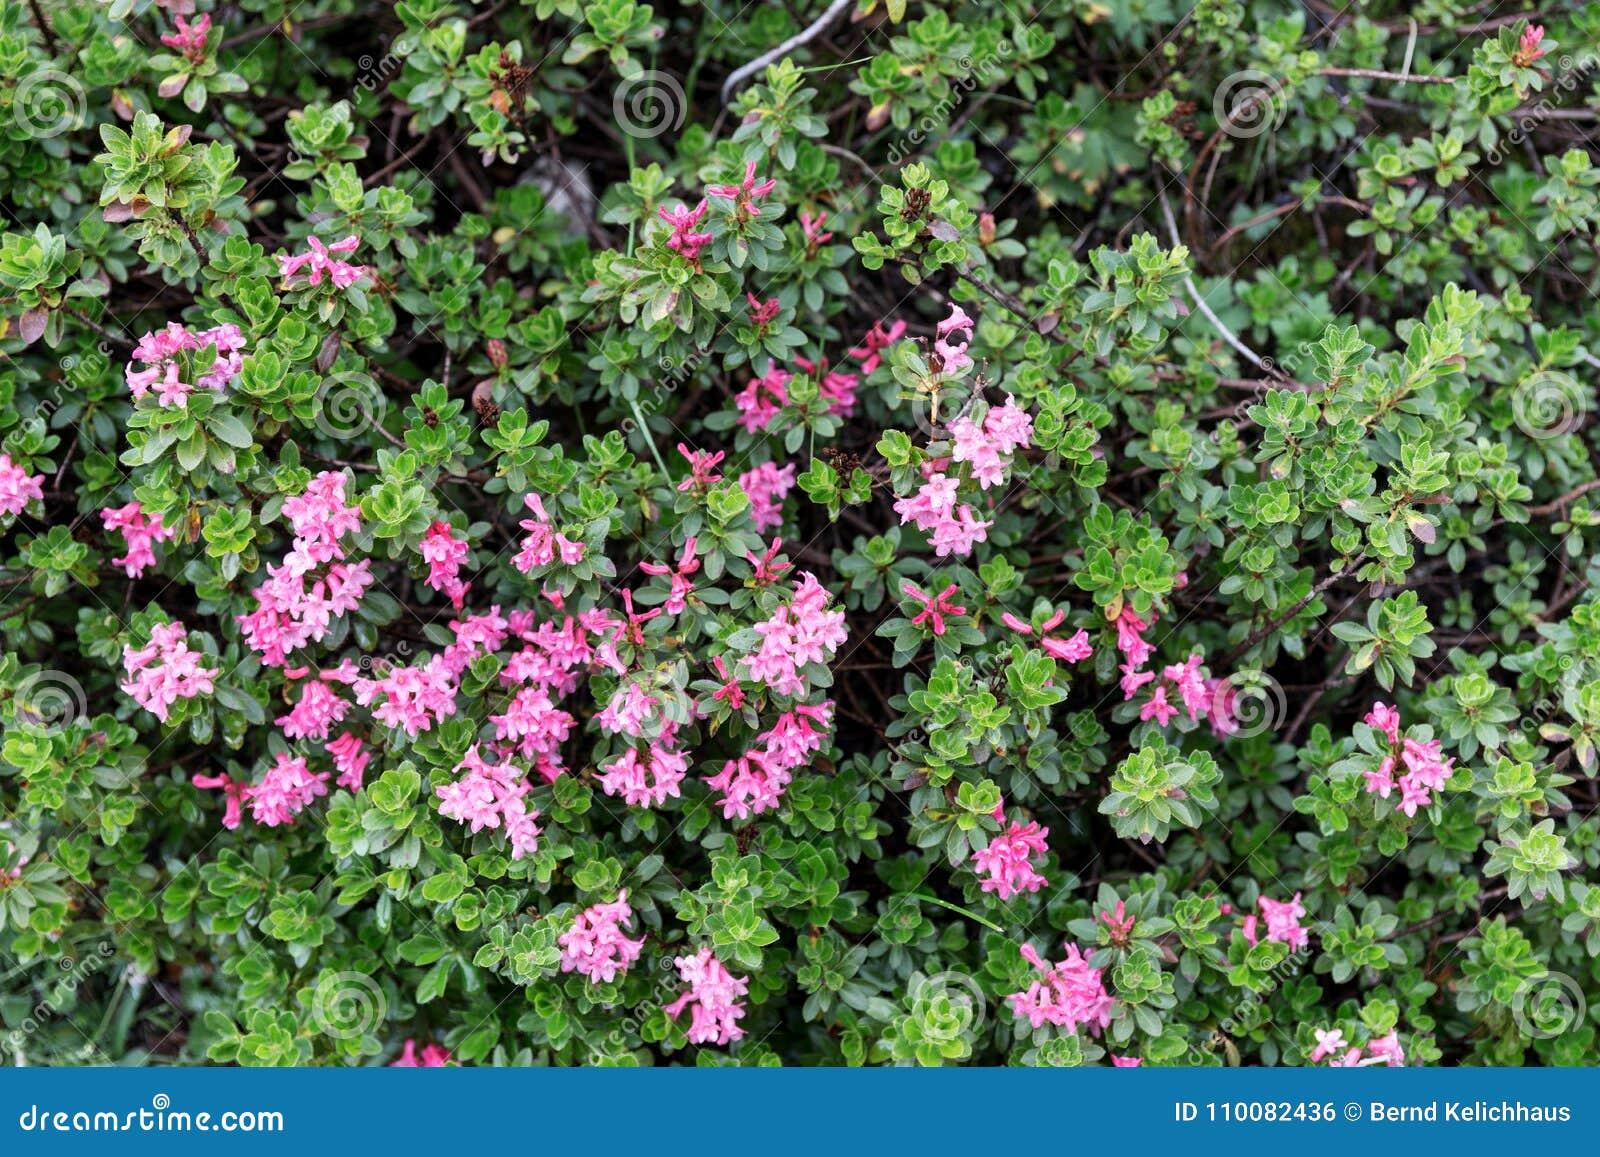 Bloom of natural alpine rose